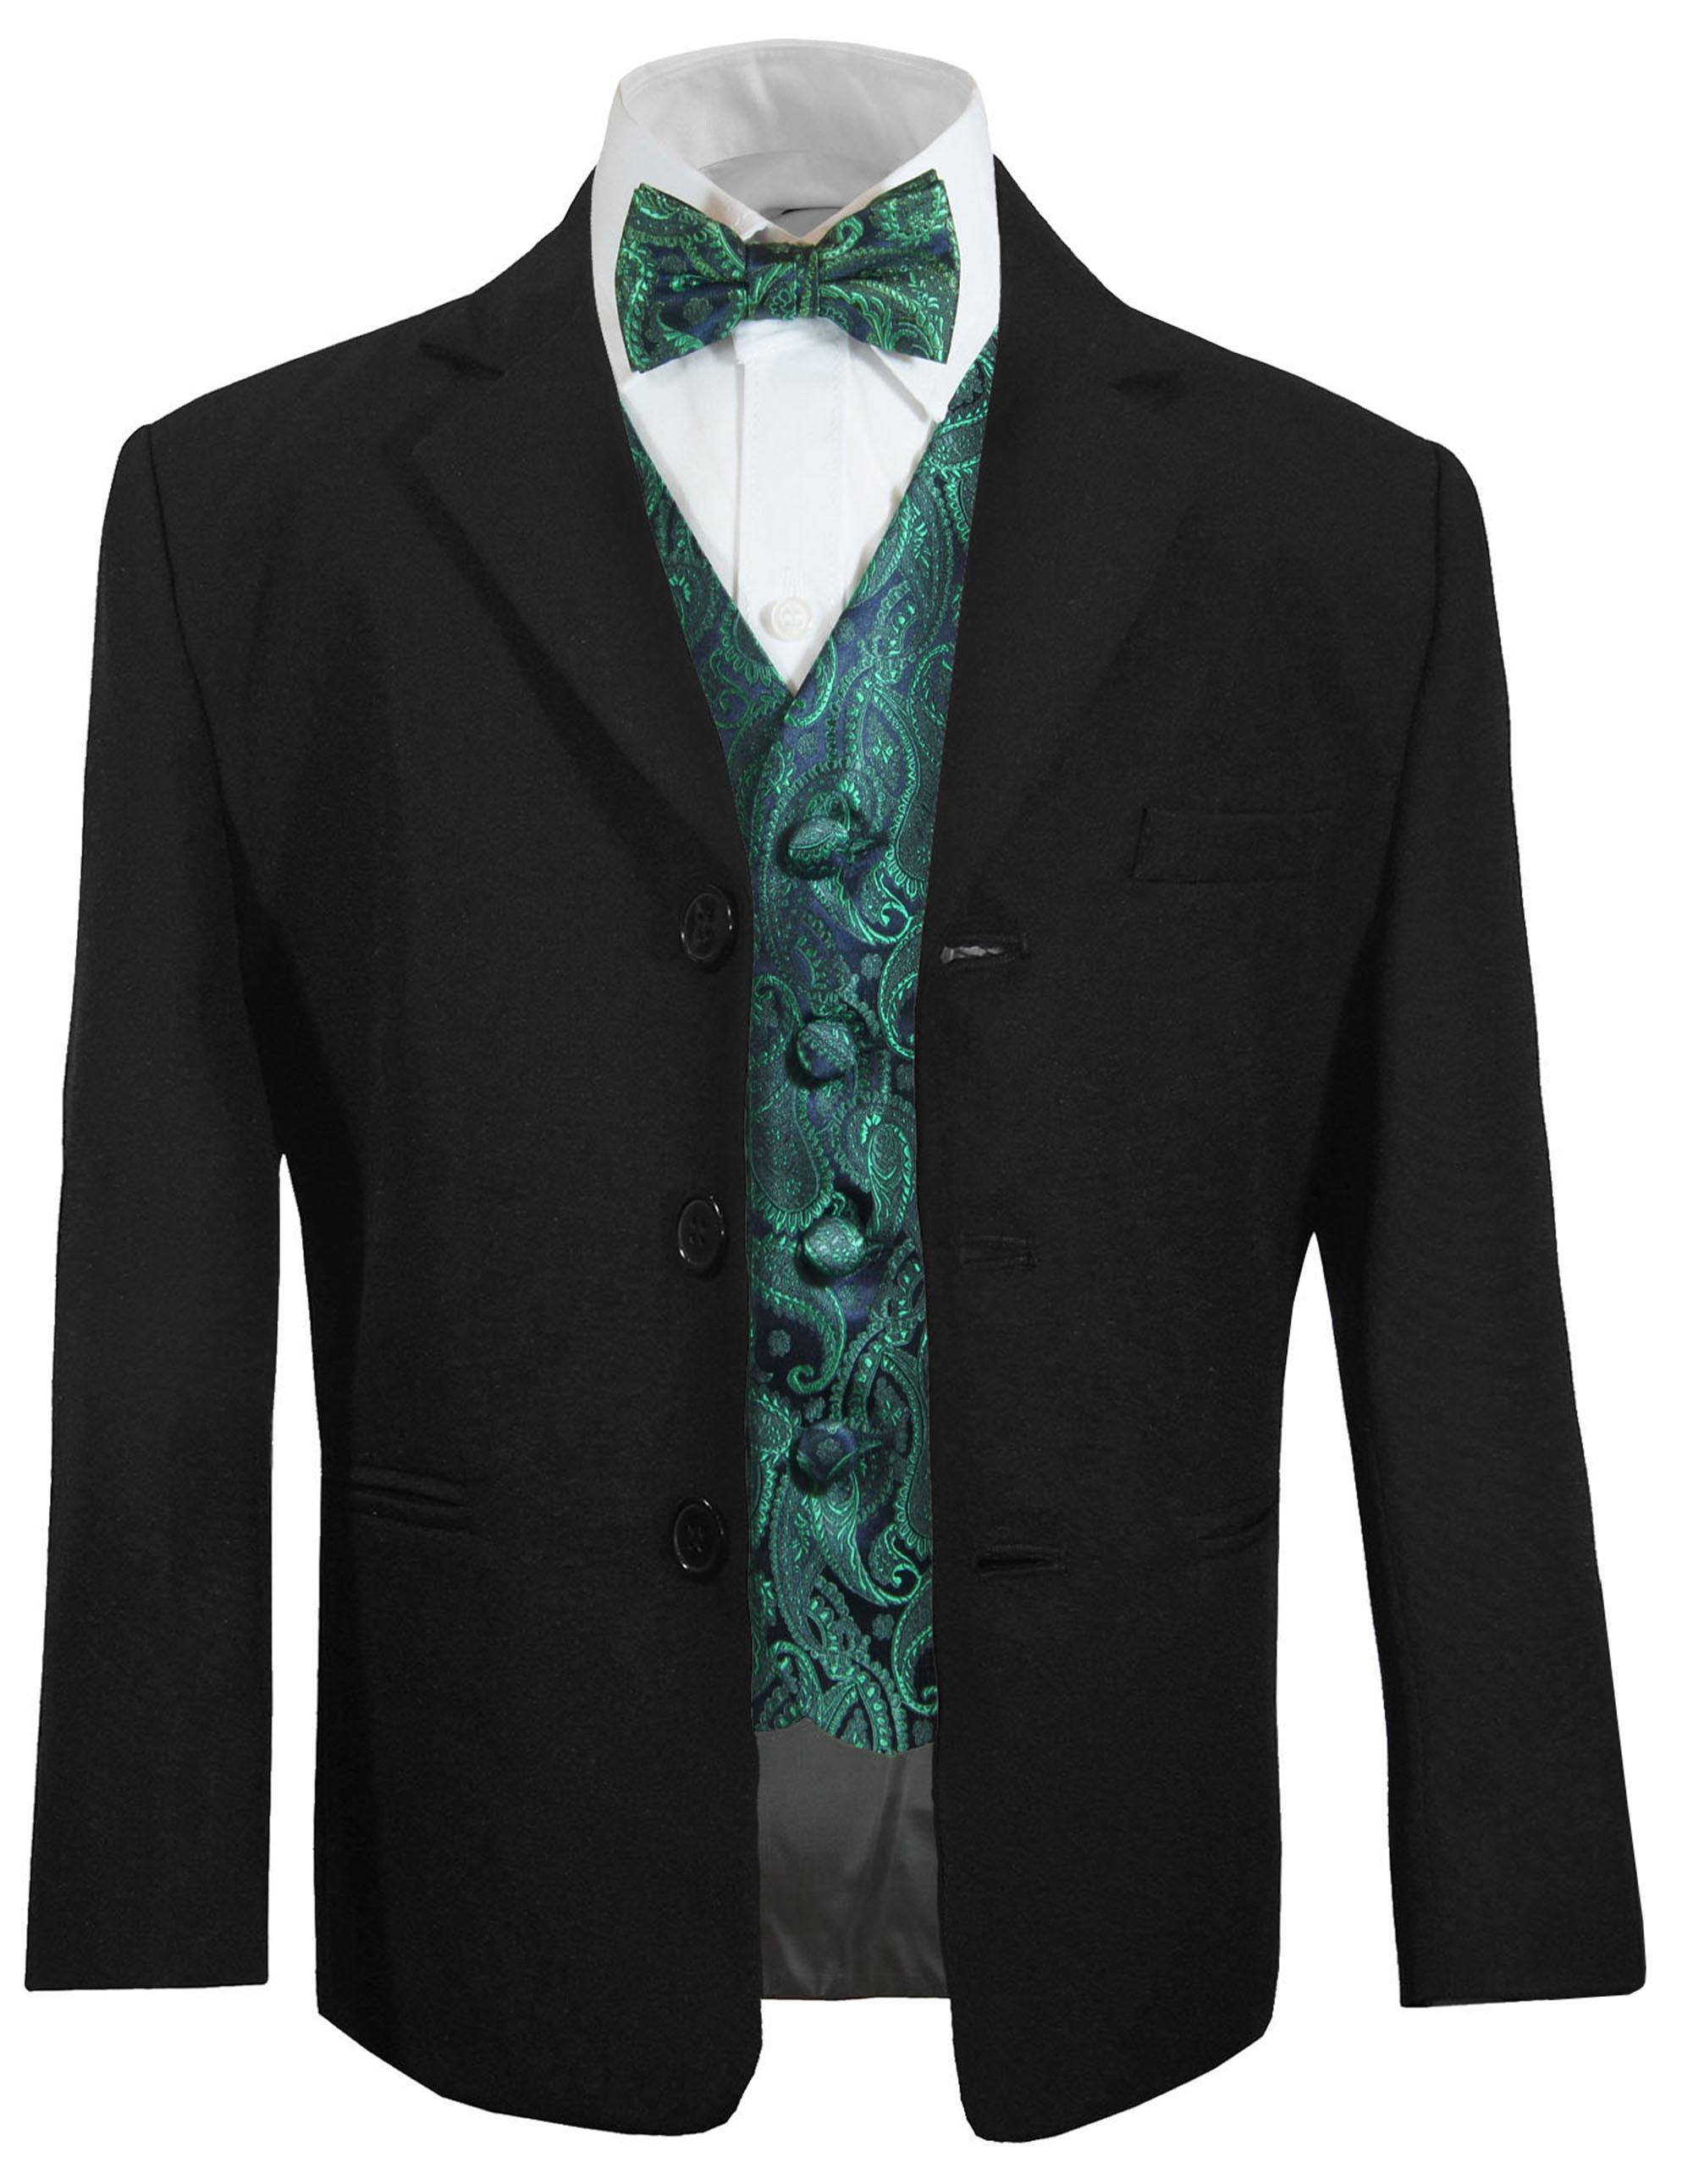 Formal Wear Boys Suit  Paisley Tuxedo Vest,Bow tie,Tie,Pocket Square Wedding Nwt